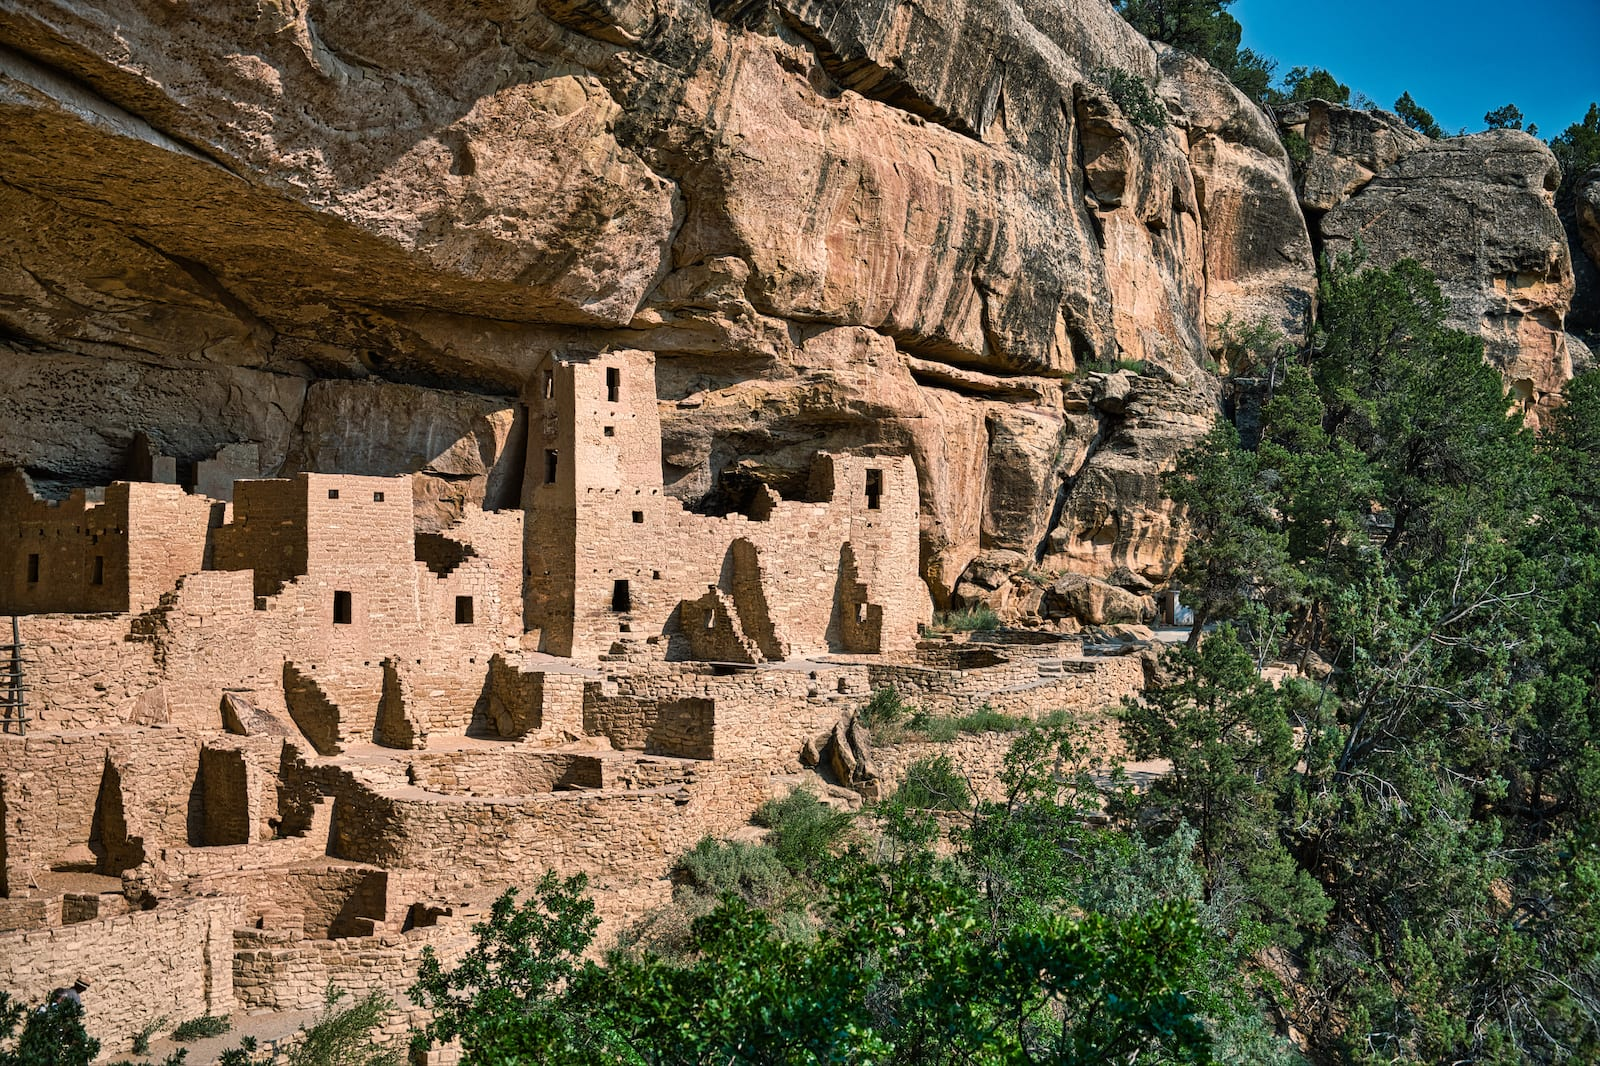 The Mesa Verde National Park, CO